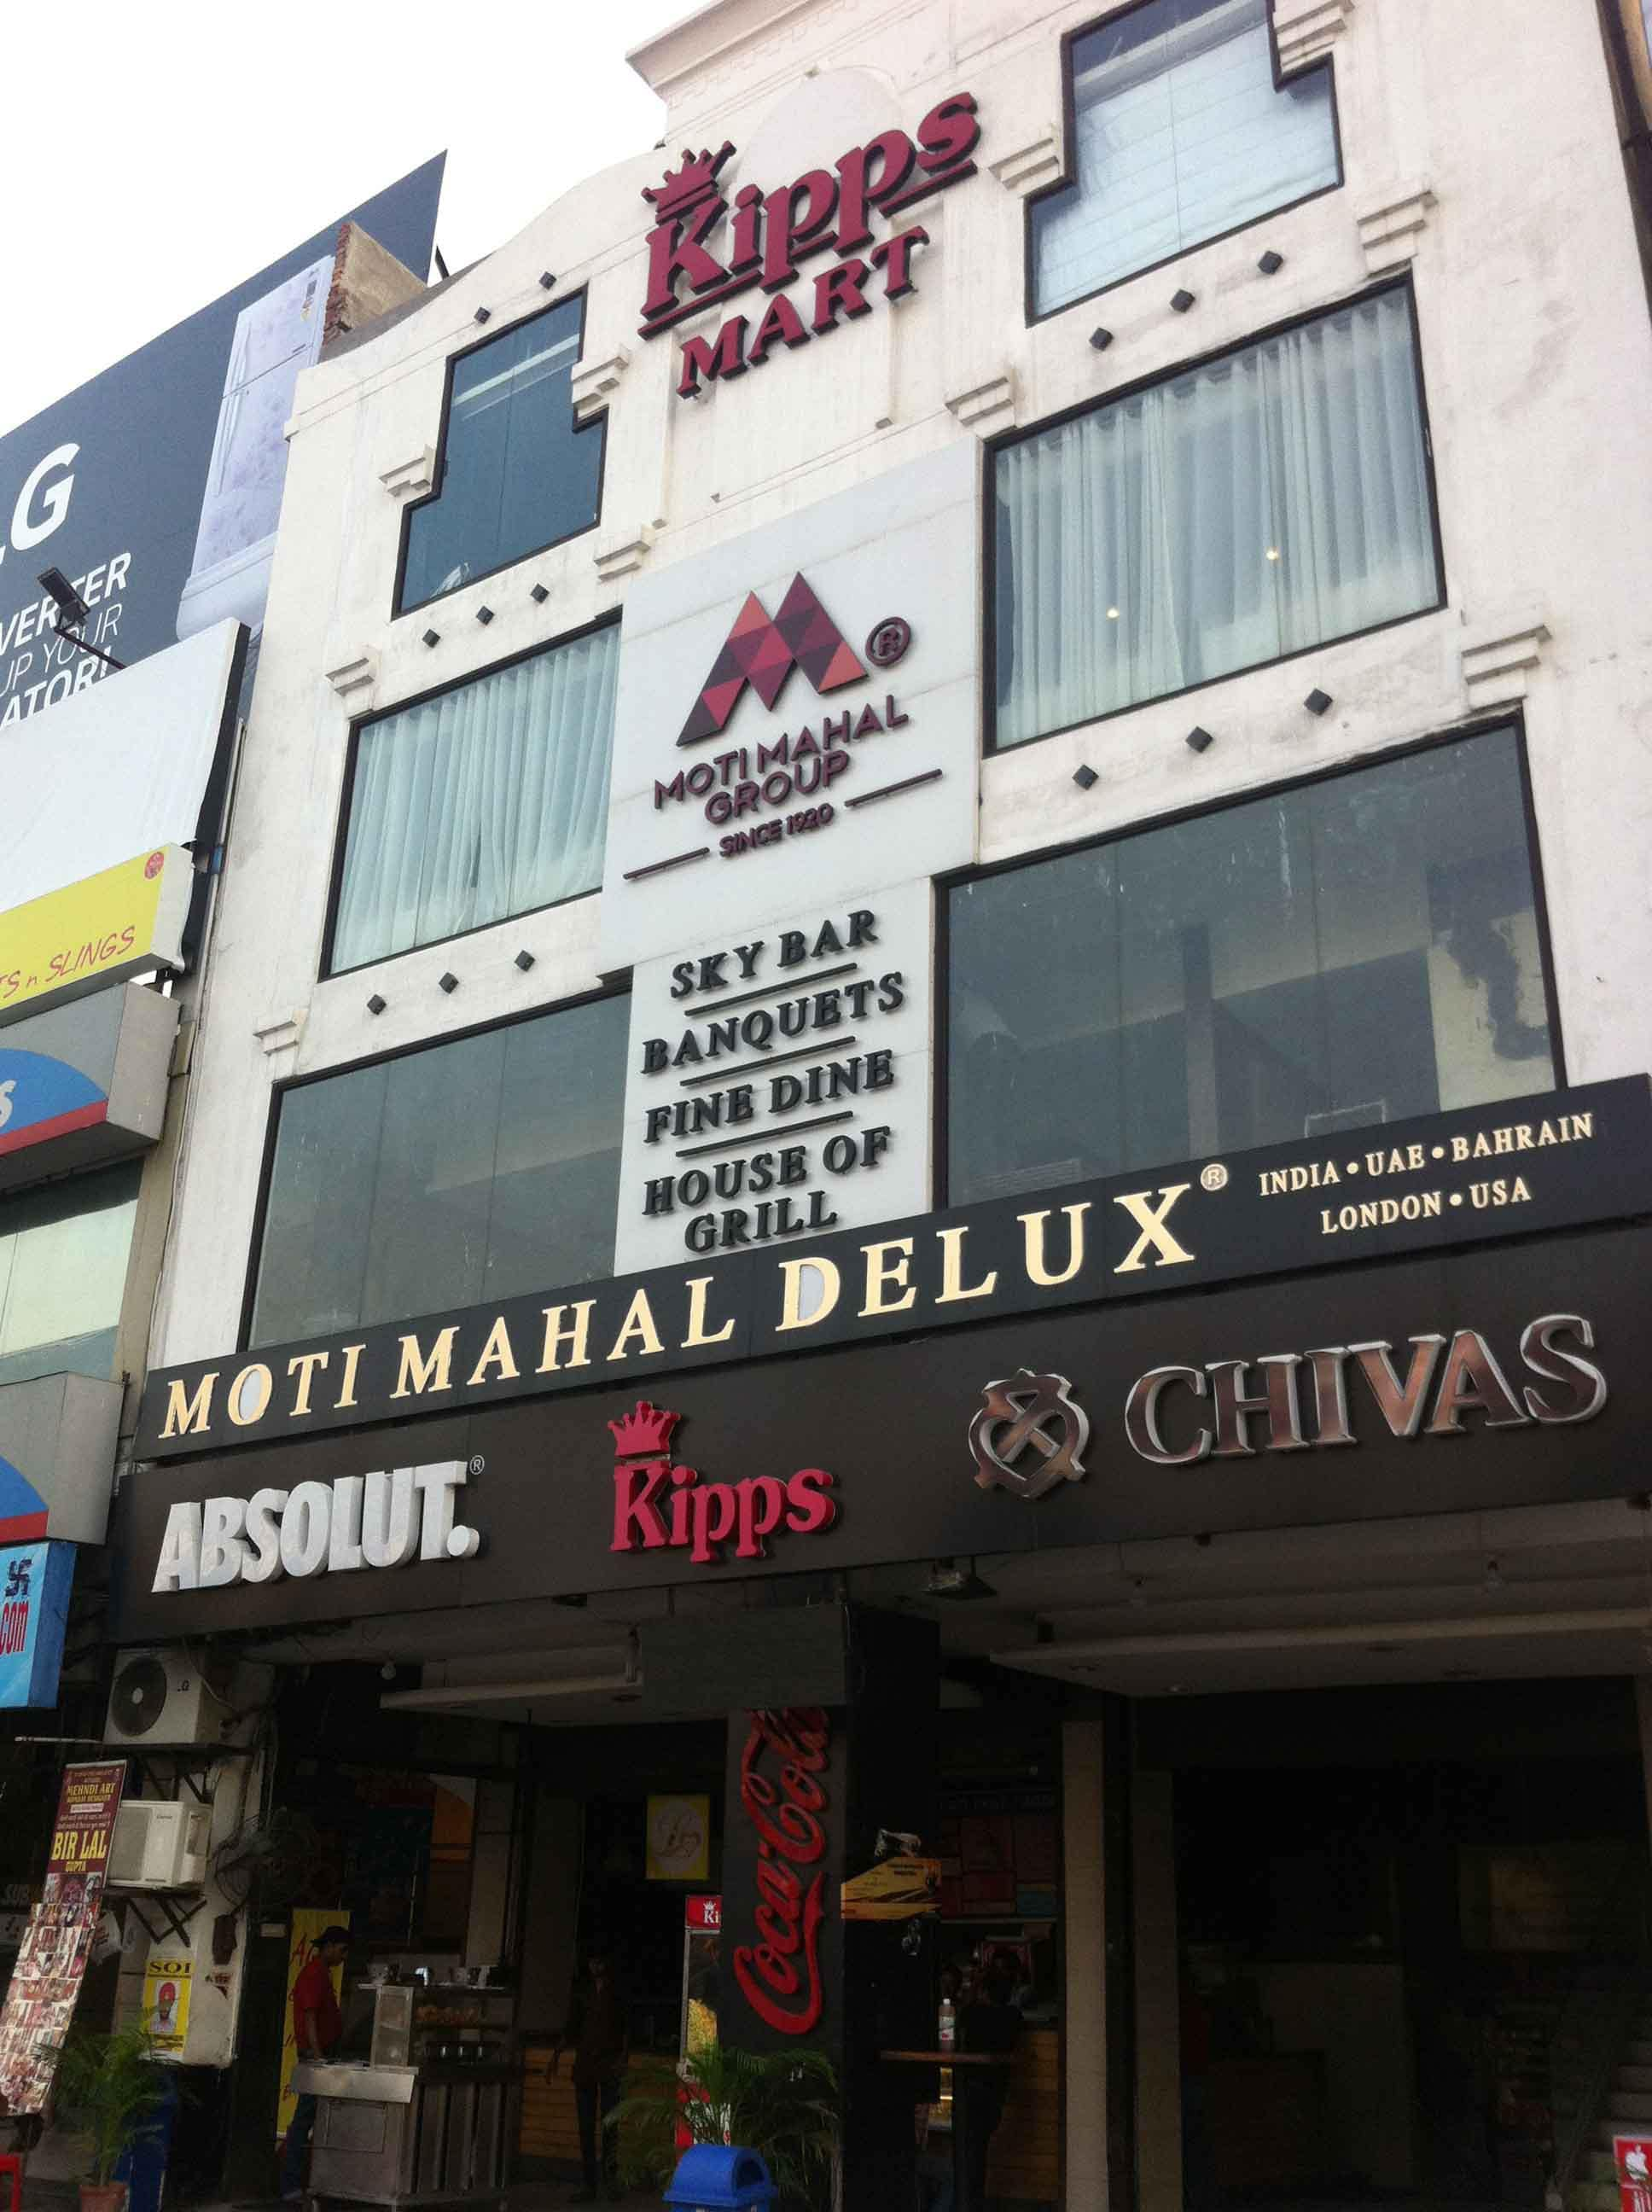 Moti Mahal Delux - Sarabha Nagar - Ludhiana Image